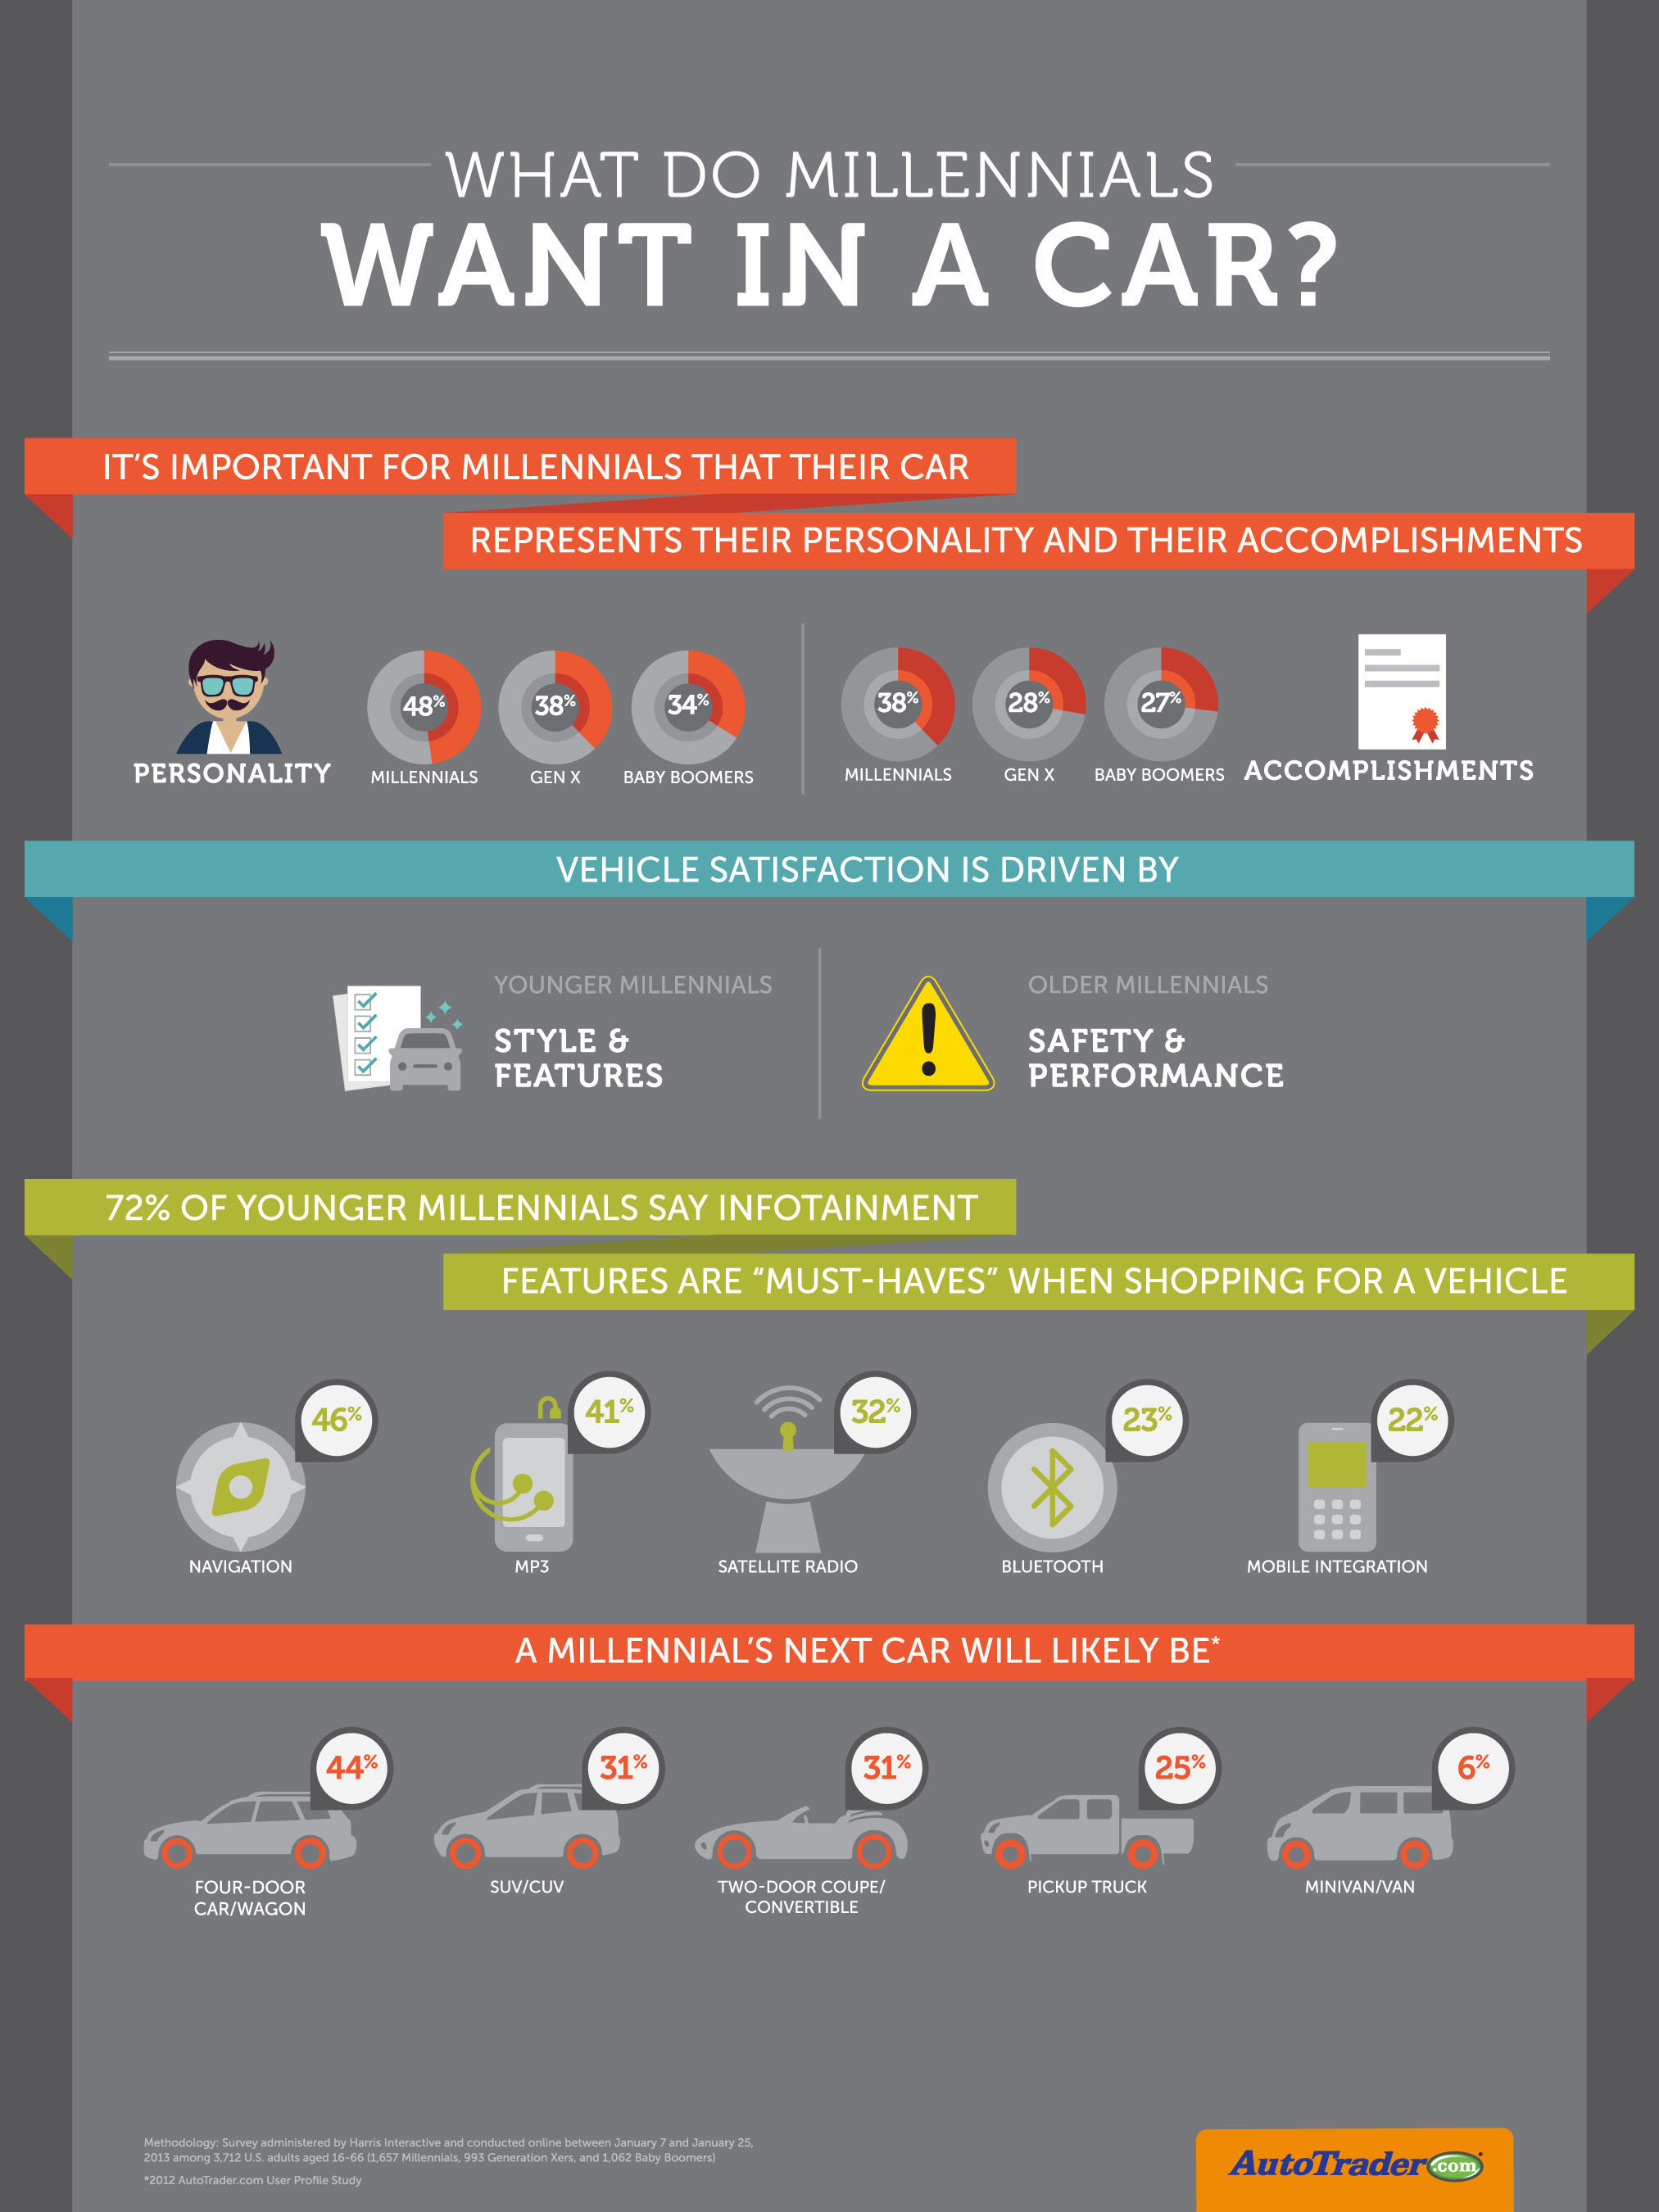 AutoTrader.com Study Reveals Deep Insights into how Millennials Relate to Cars